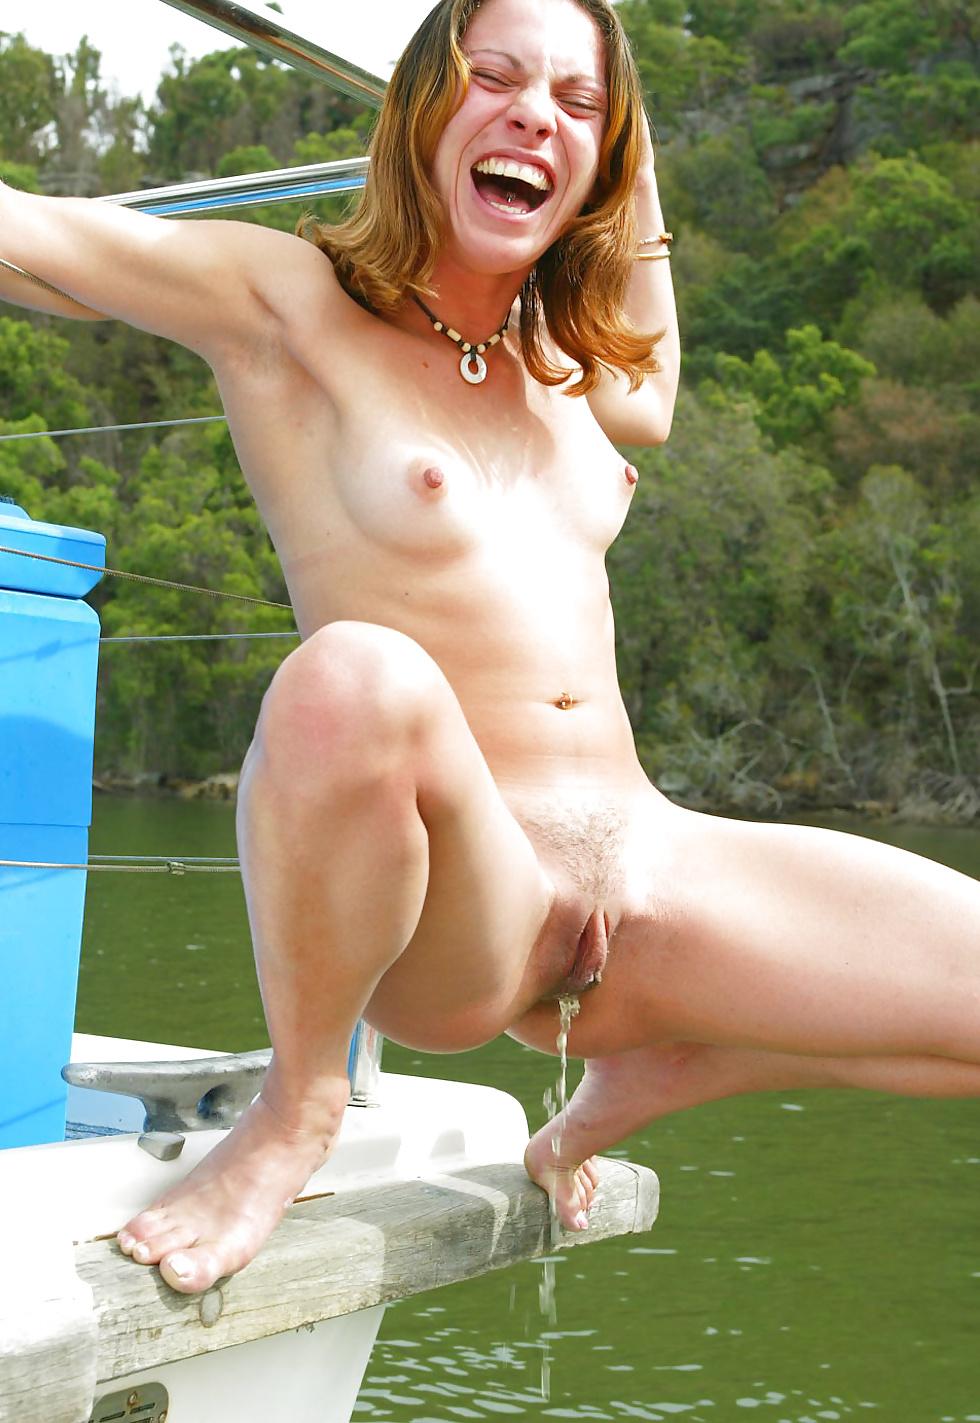 Pussy pumping porn pics